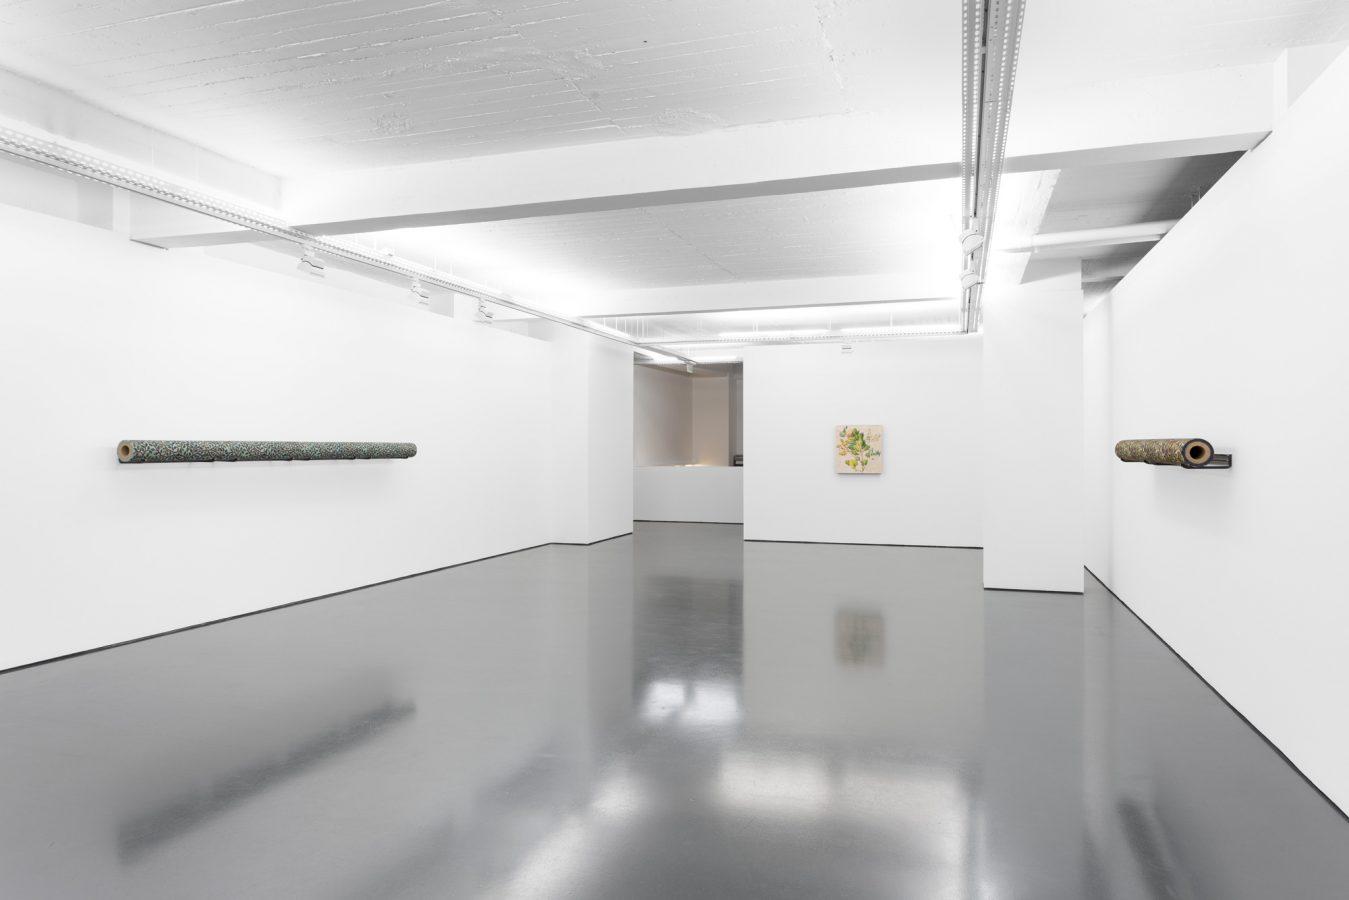 Galeria Pedro Cera – David Thorpe - Lush Underground